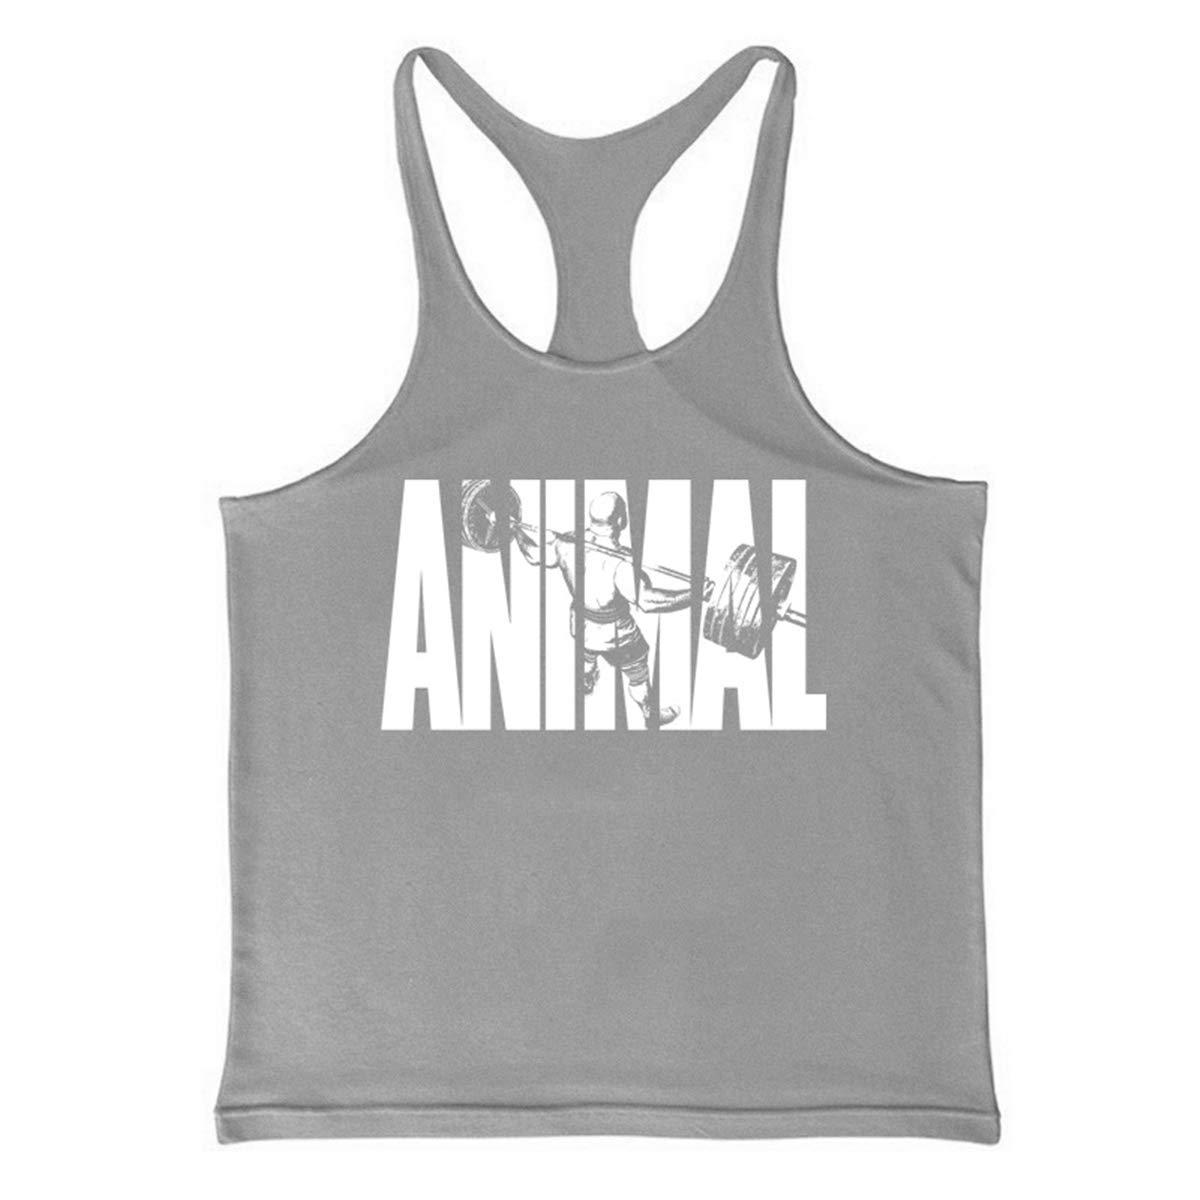 e92c7308b467e Cabeen Hommes Animal Musculation Stringer Bodybuilding Débardeur Tank Tops  Sport Shirt  Amazon.fr  Sports et Loisirs